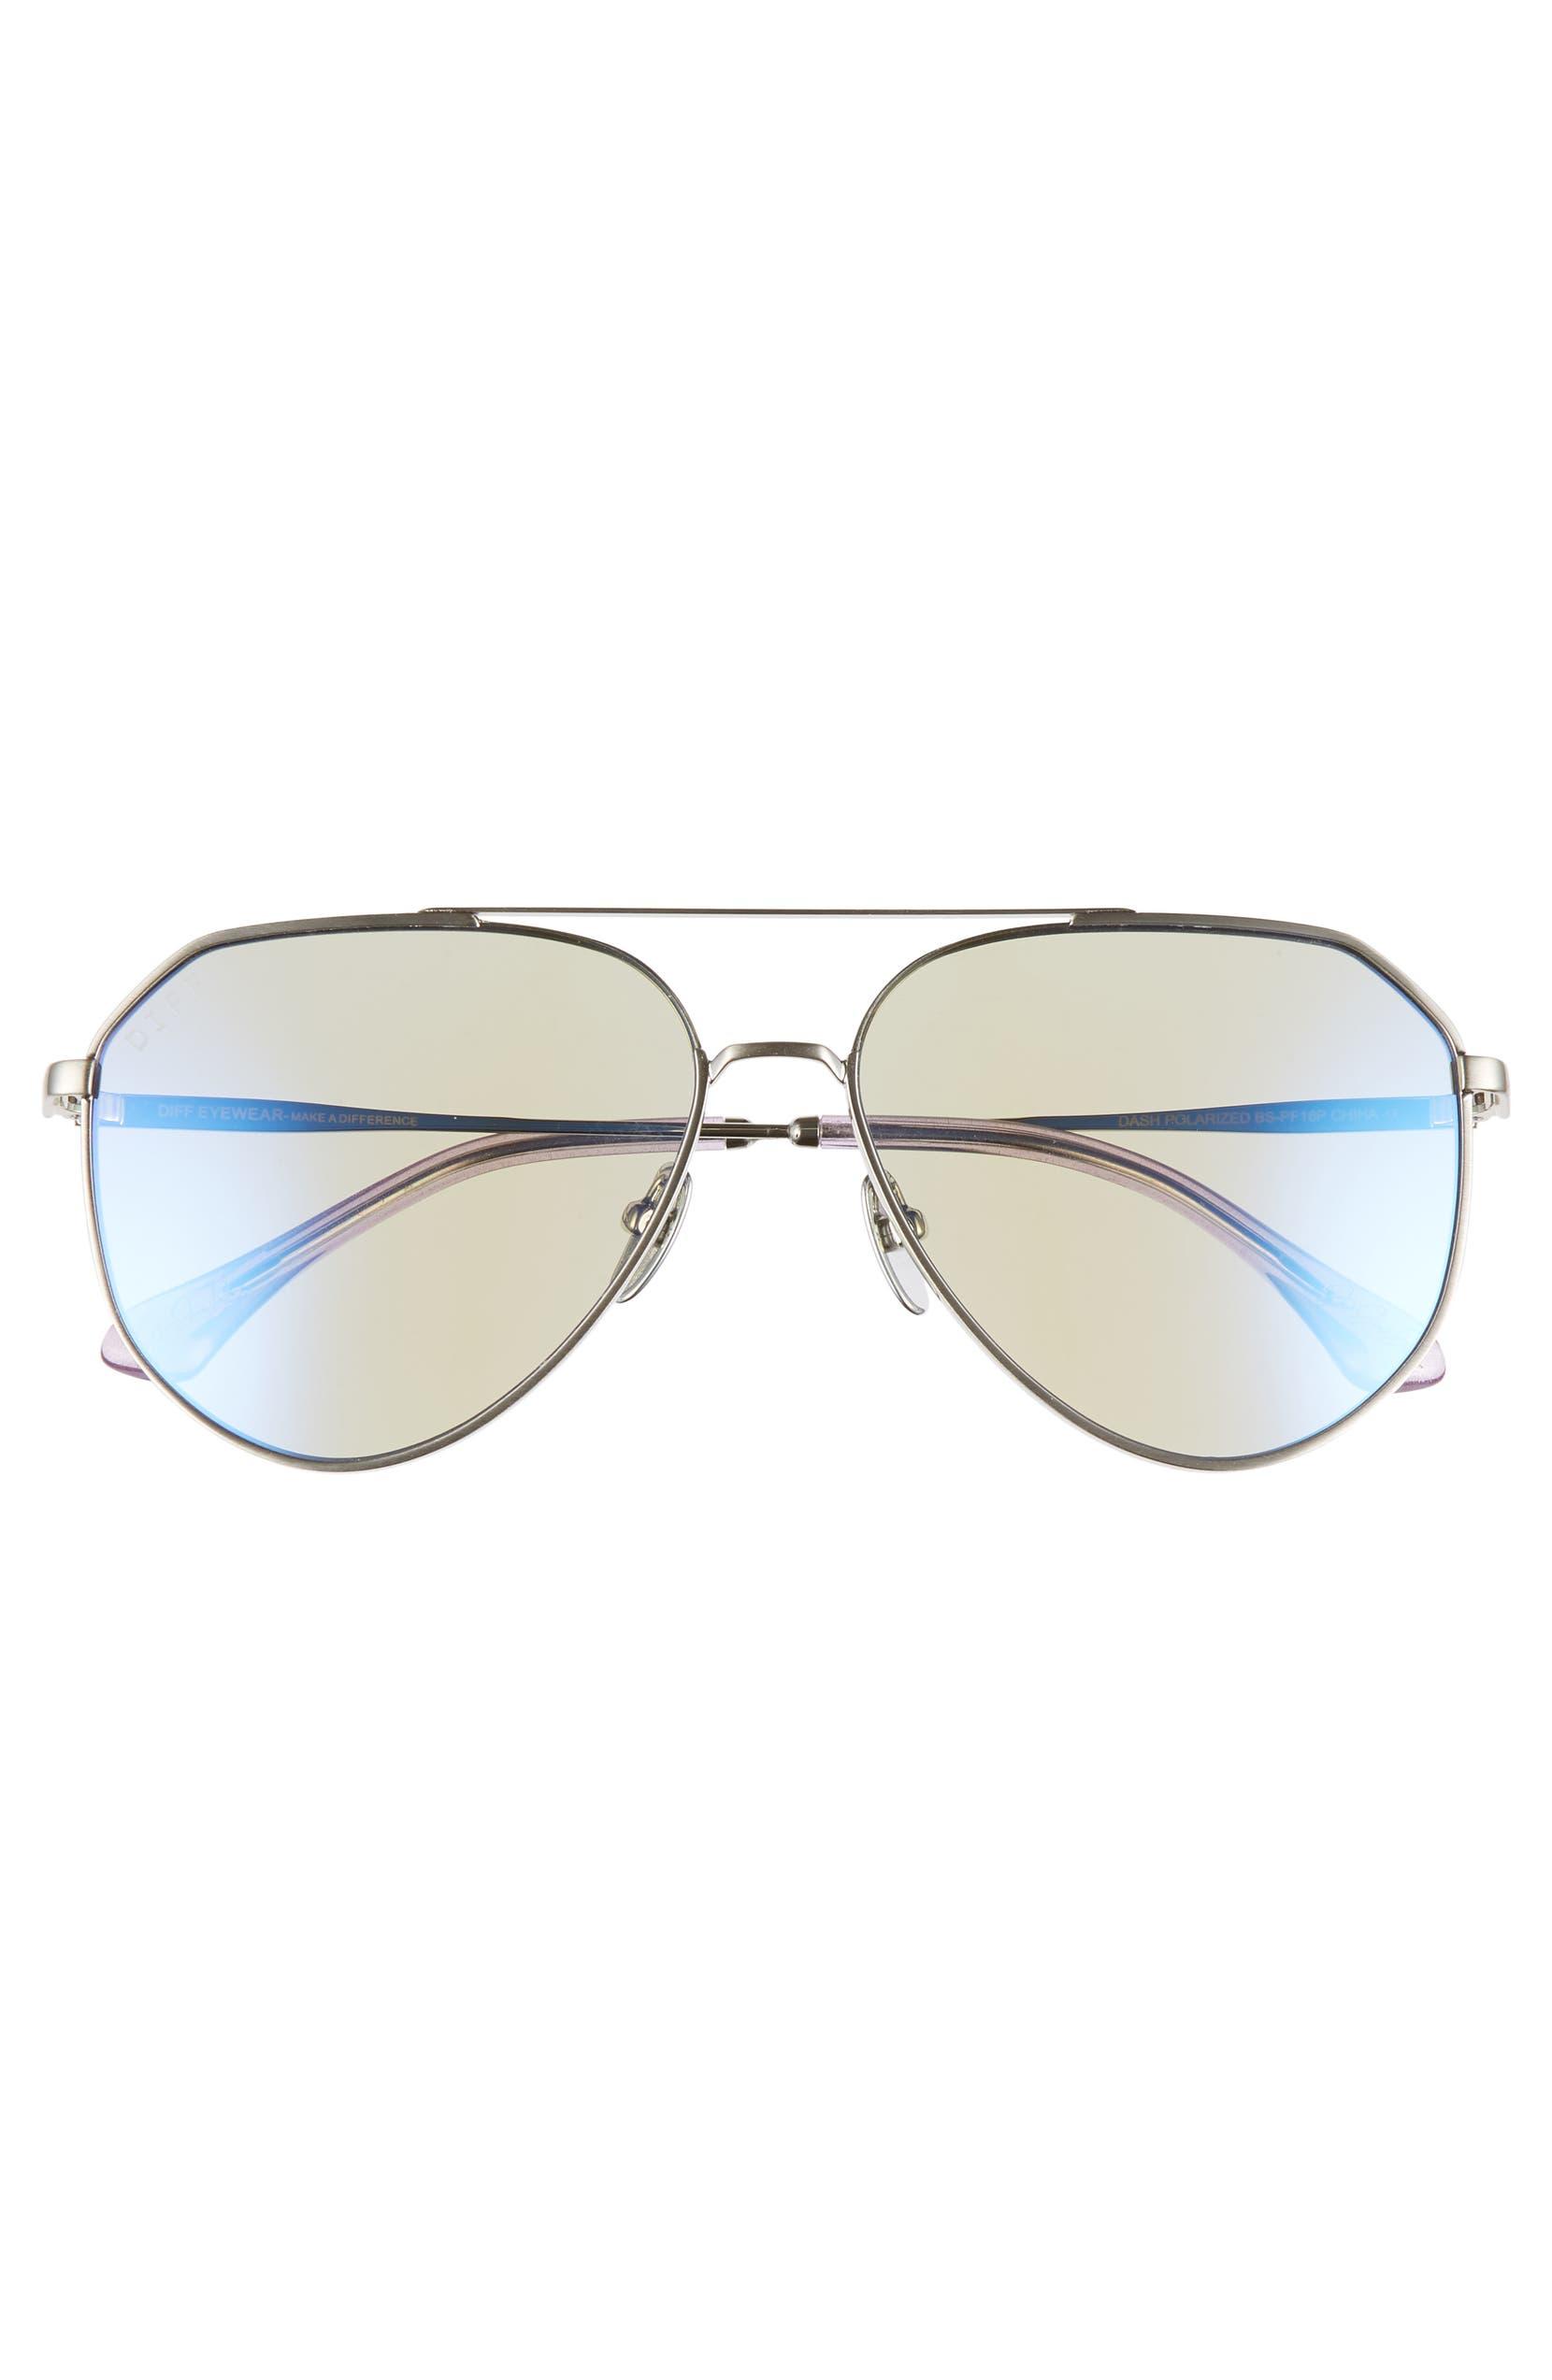 ba7c3a96a9c9c DIFF x Jessie James Decker Dash 61mm Polarized Aviator Sunglasses ...